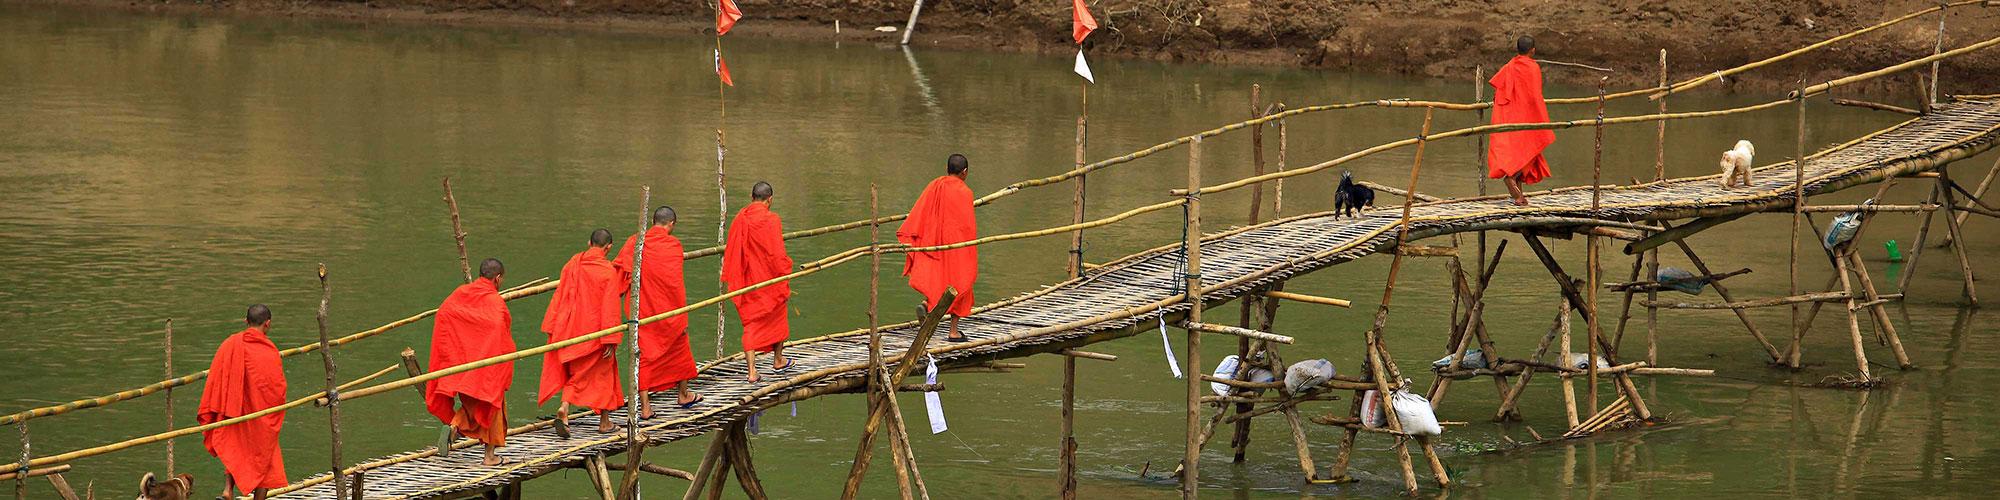 Laotian Speaking Monks on Stick Bridge